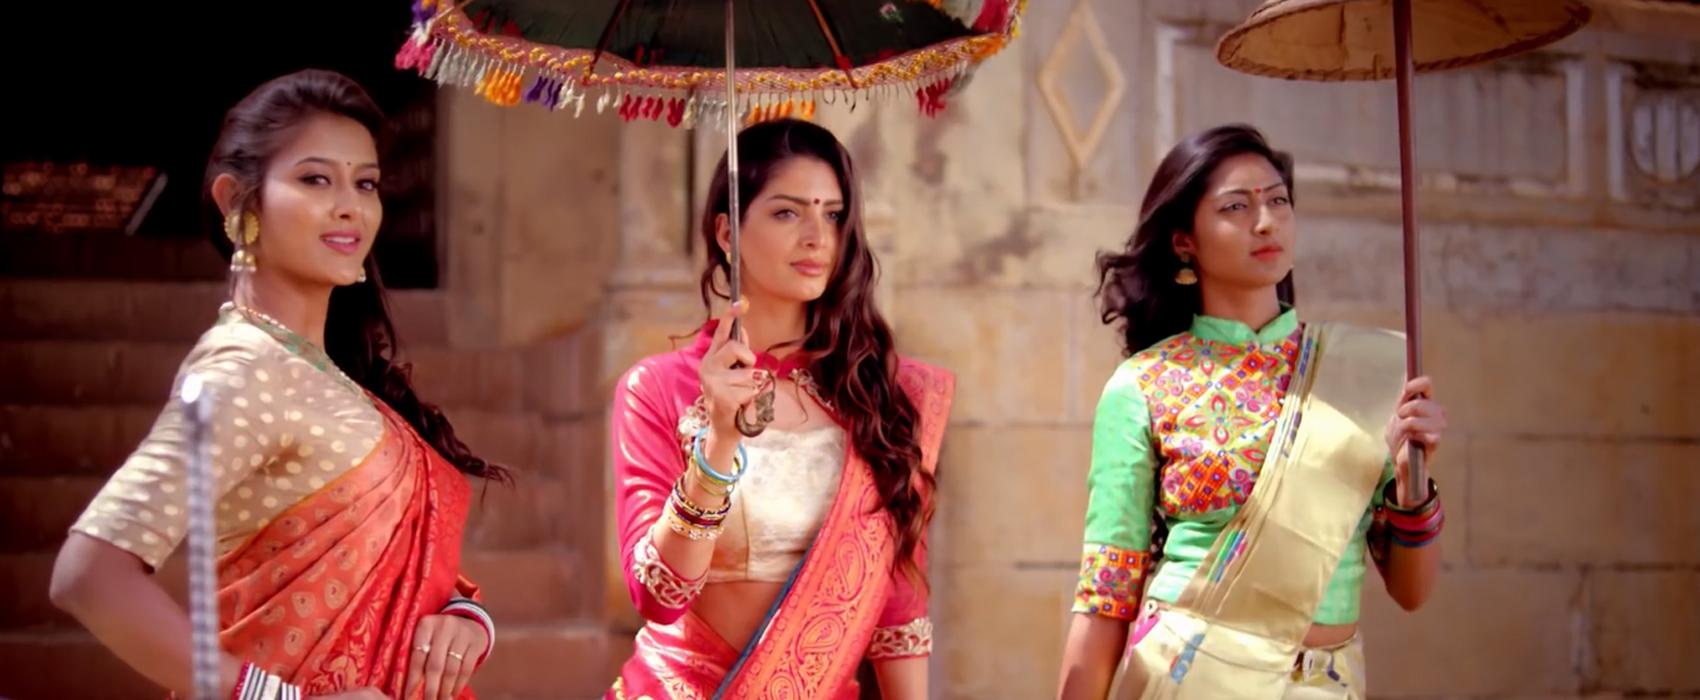 Attractive Silk and Zari Sarees put on Display at Lakkars